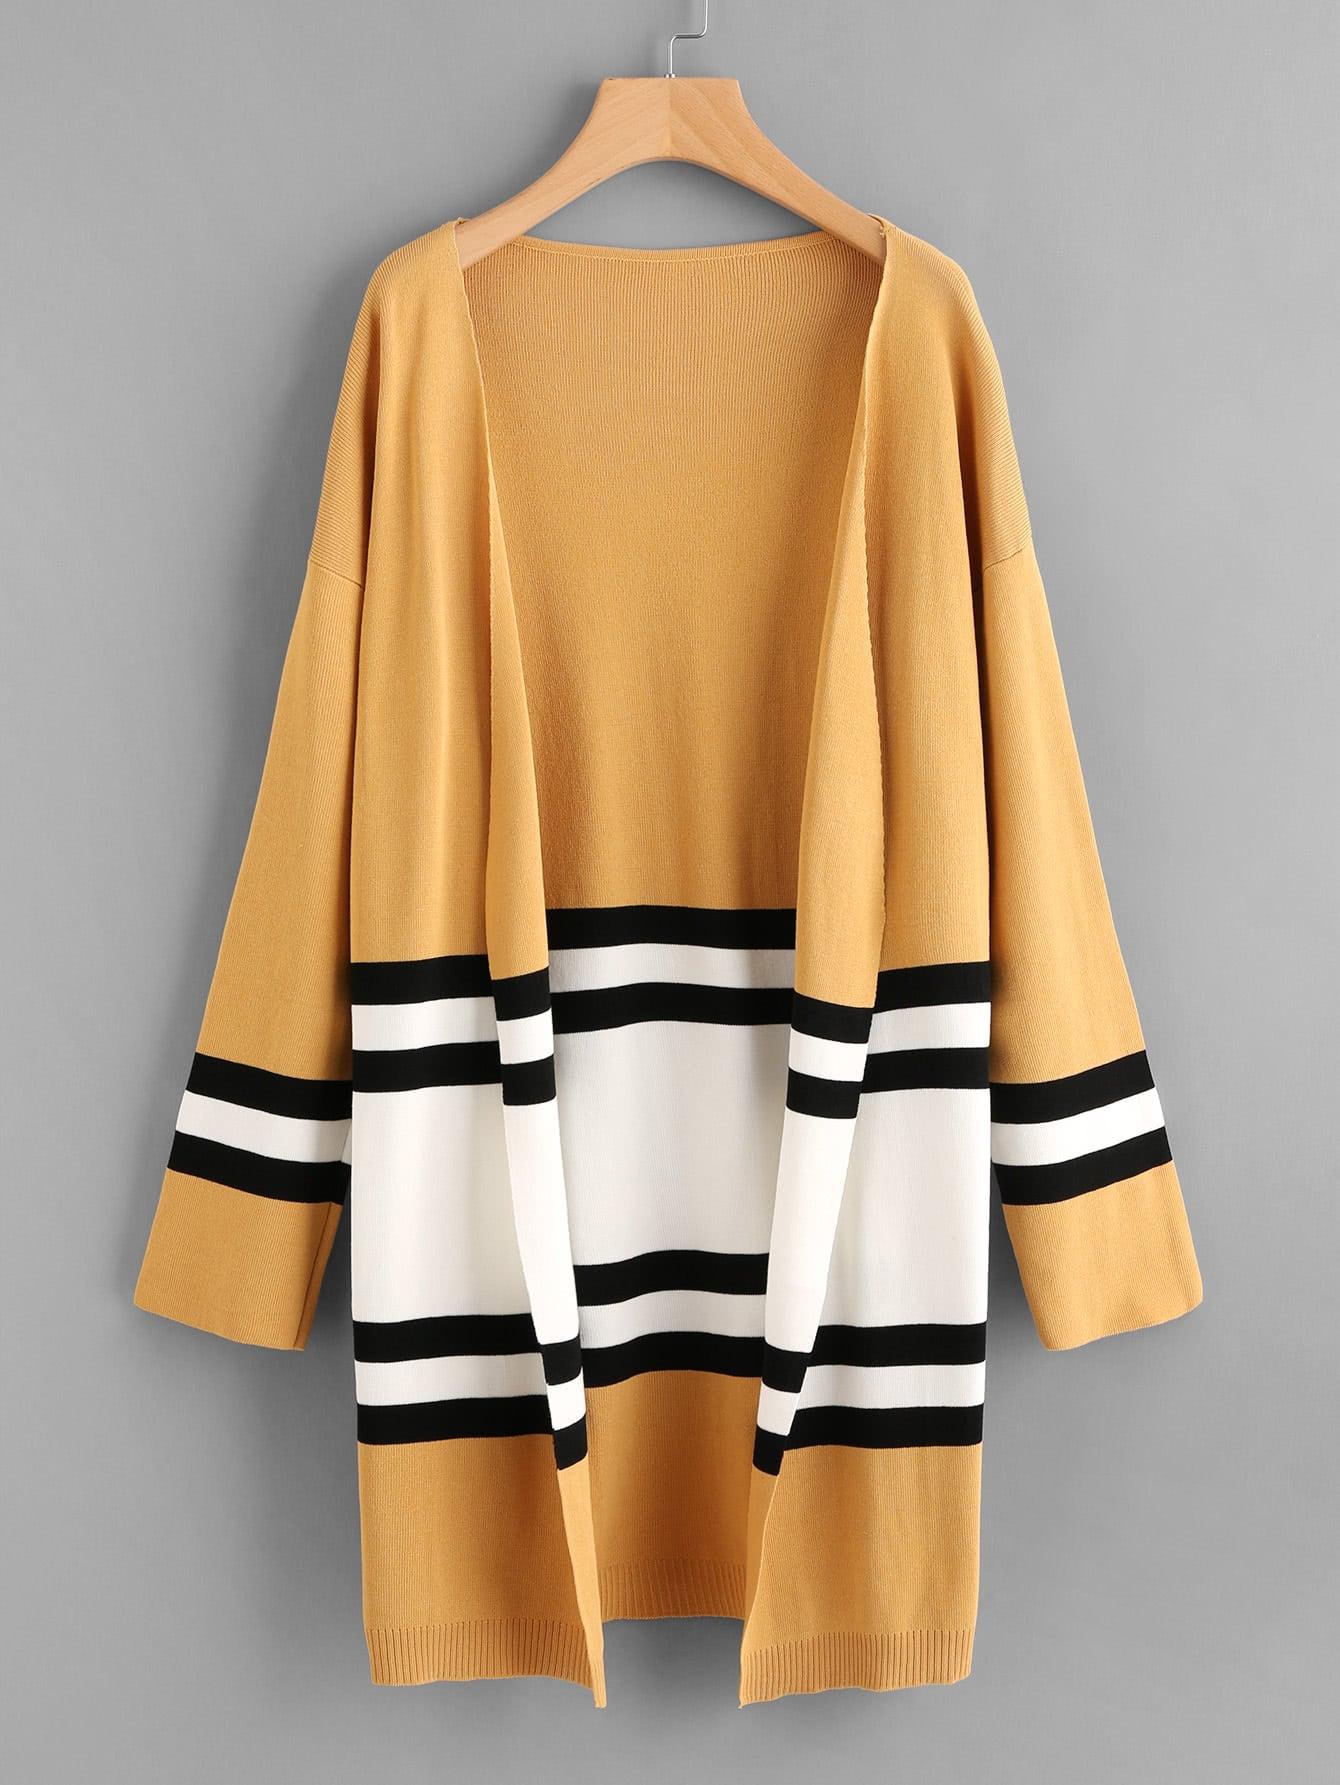 Contrast Stripe Panel Drop Shoulder Jersey Cardigan sweater170911301